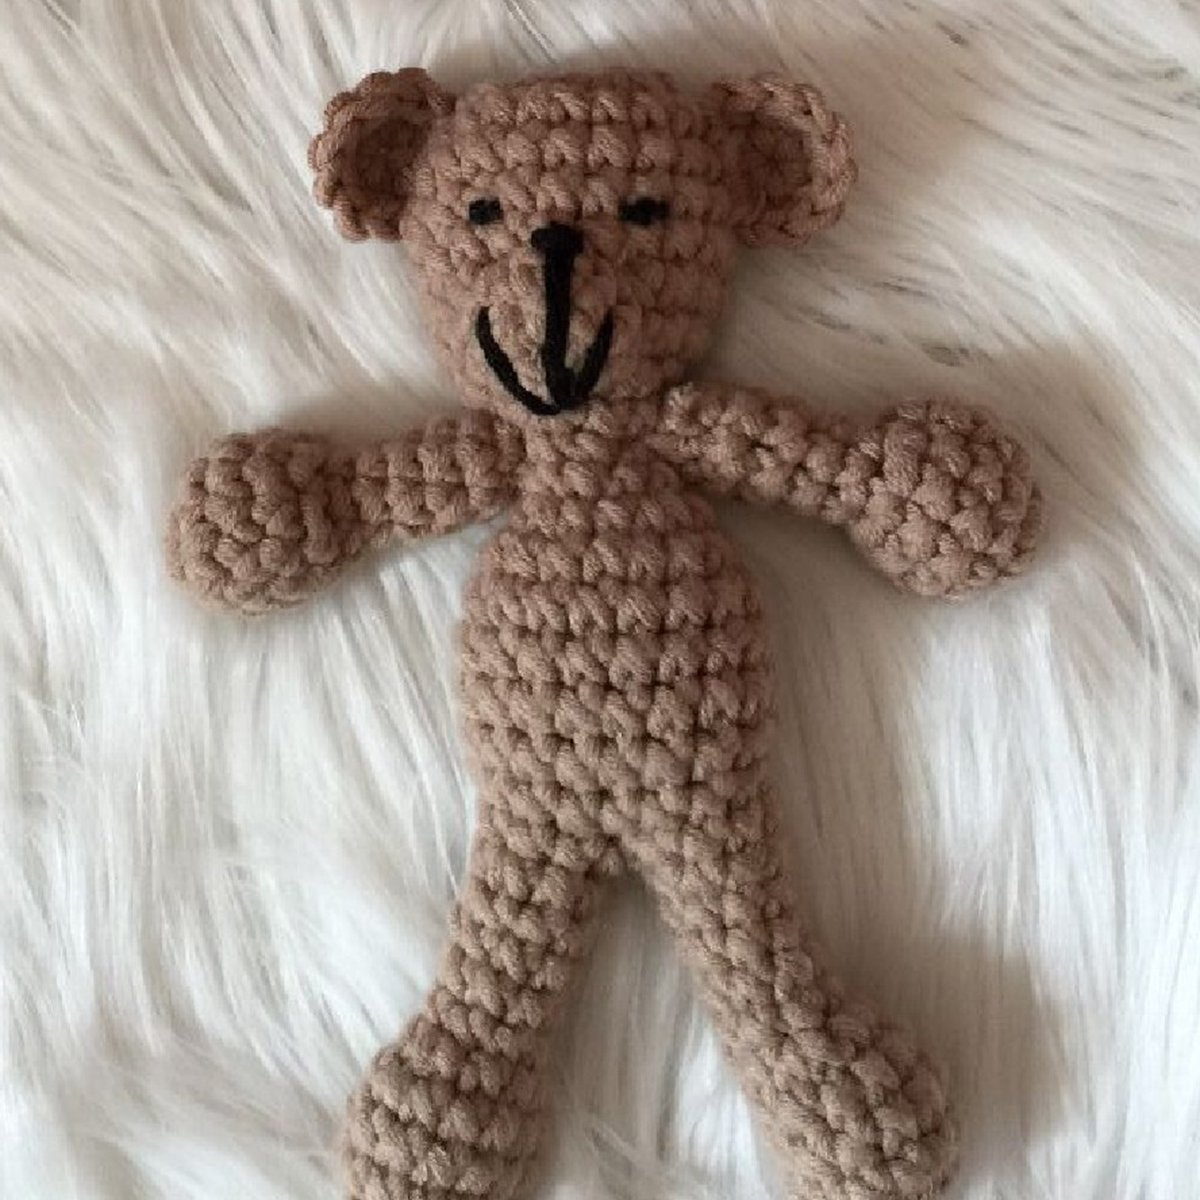 Tris/&Ton pack set quitababas de microfibra suave para bebe ni/ño ni/ña con dibujos animados pack 1 Trisyton baberos bandana para bebe ajustable